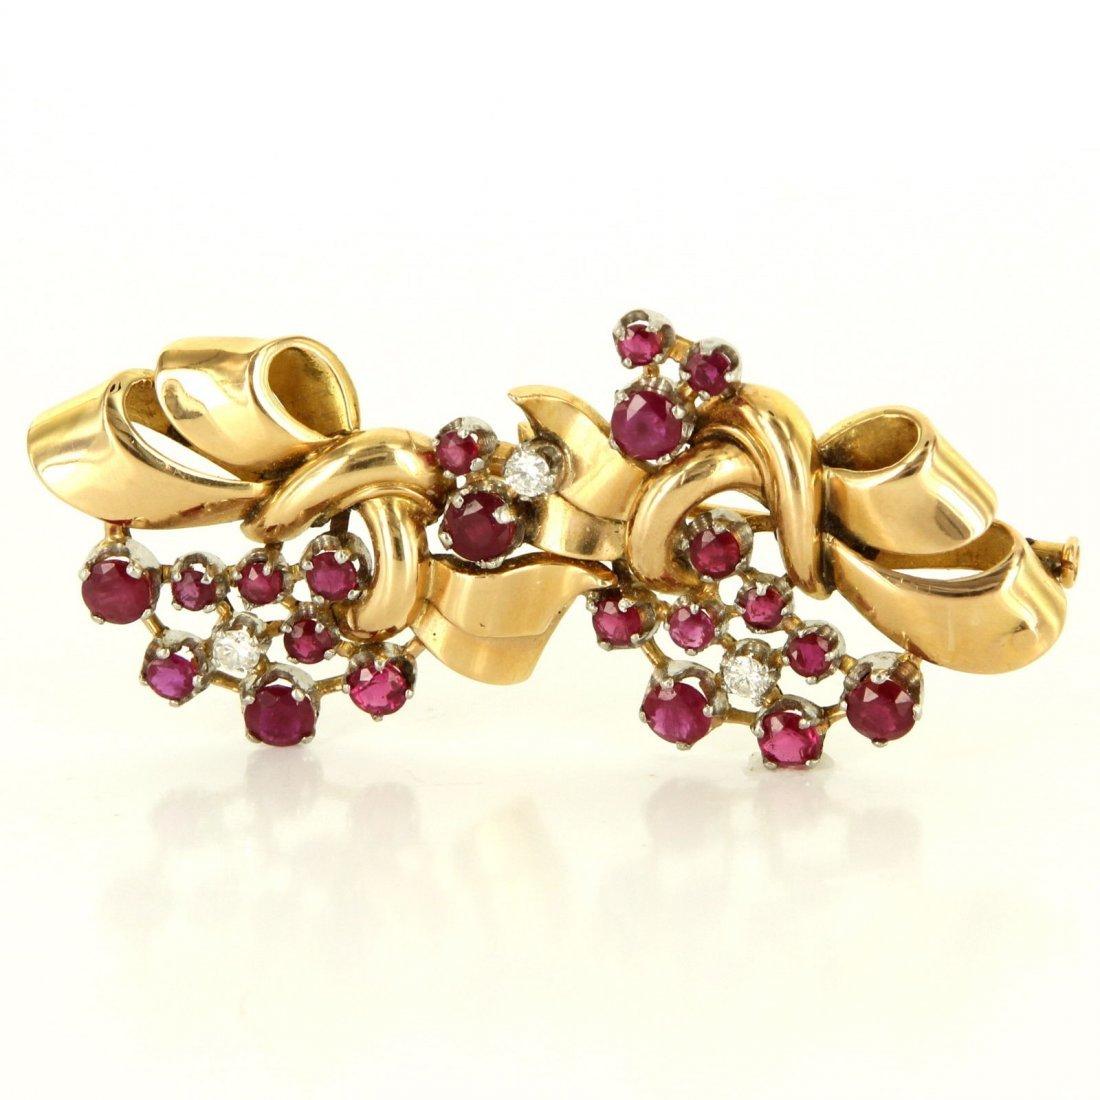 French Deco Retro 18 Karat Yellow Gold Diamond Ruby